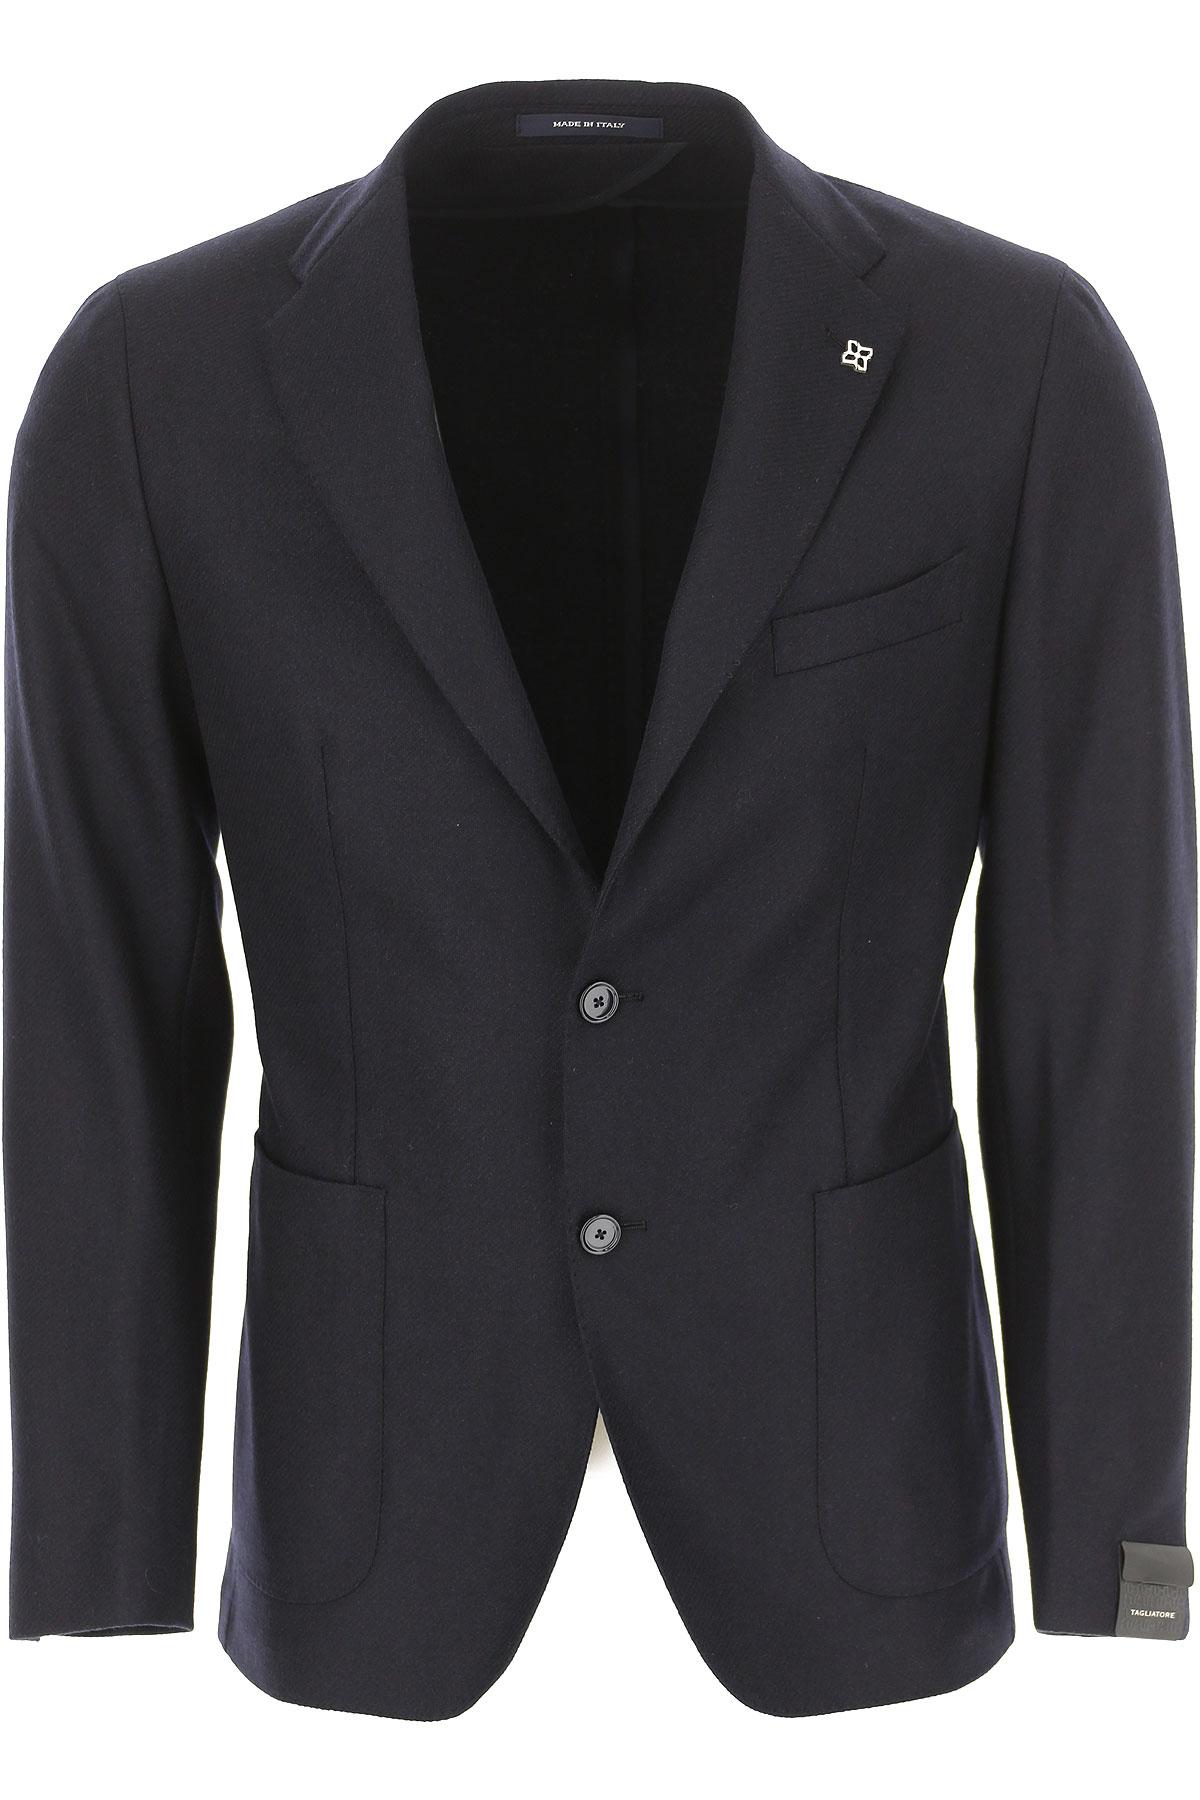 Image of Tagliatore Blazer for Men, Sport Coat, Blue Ink, Virgin wool, 2017, L M XL